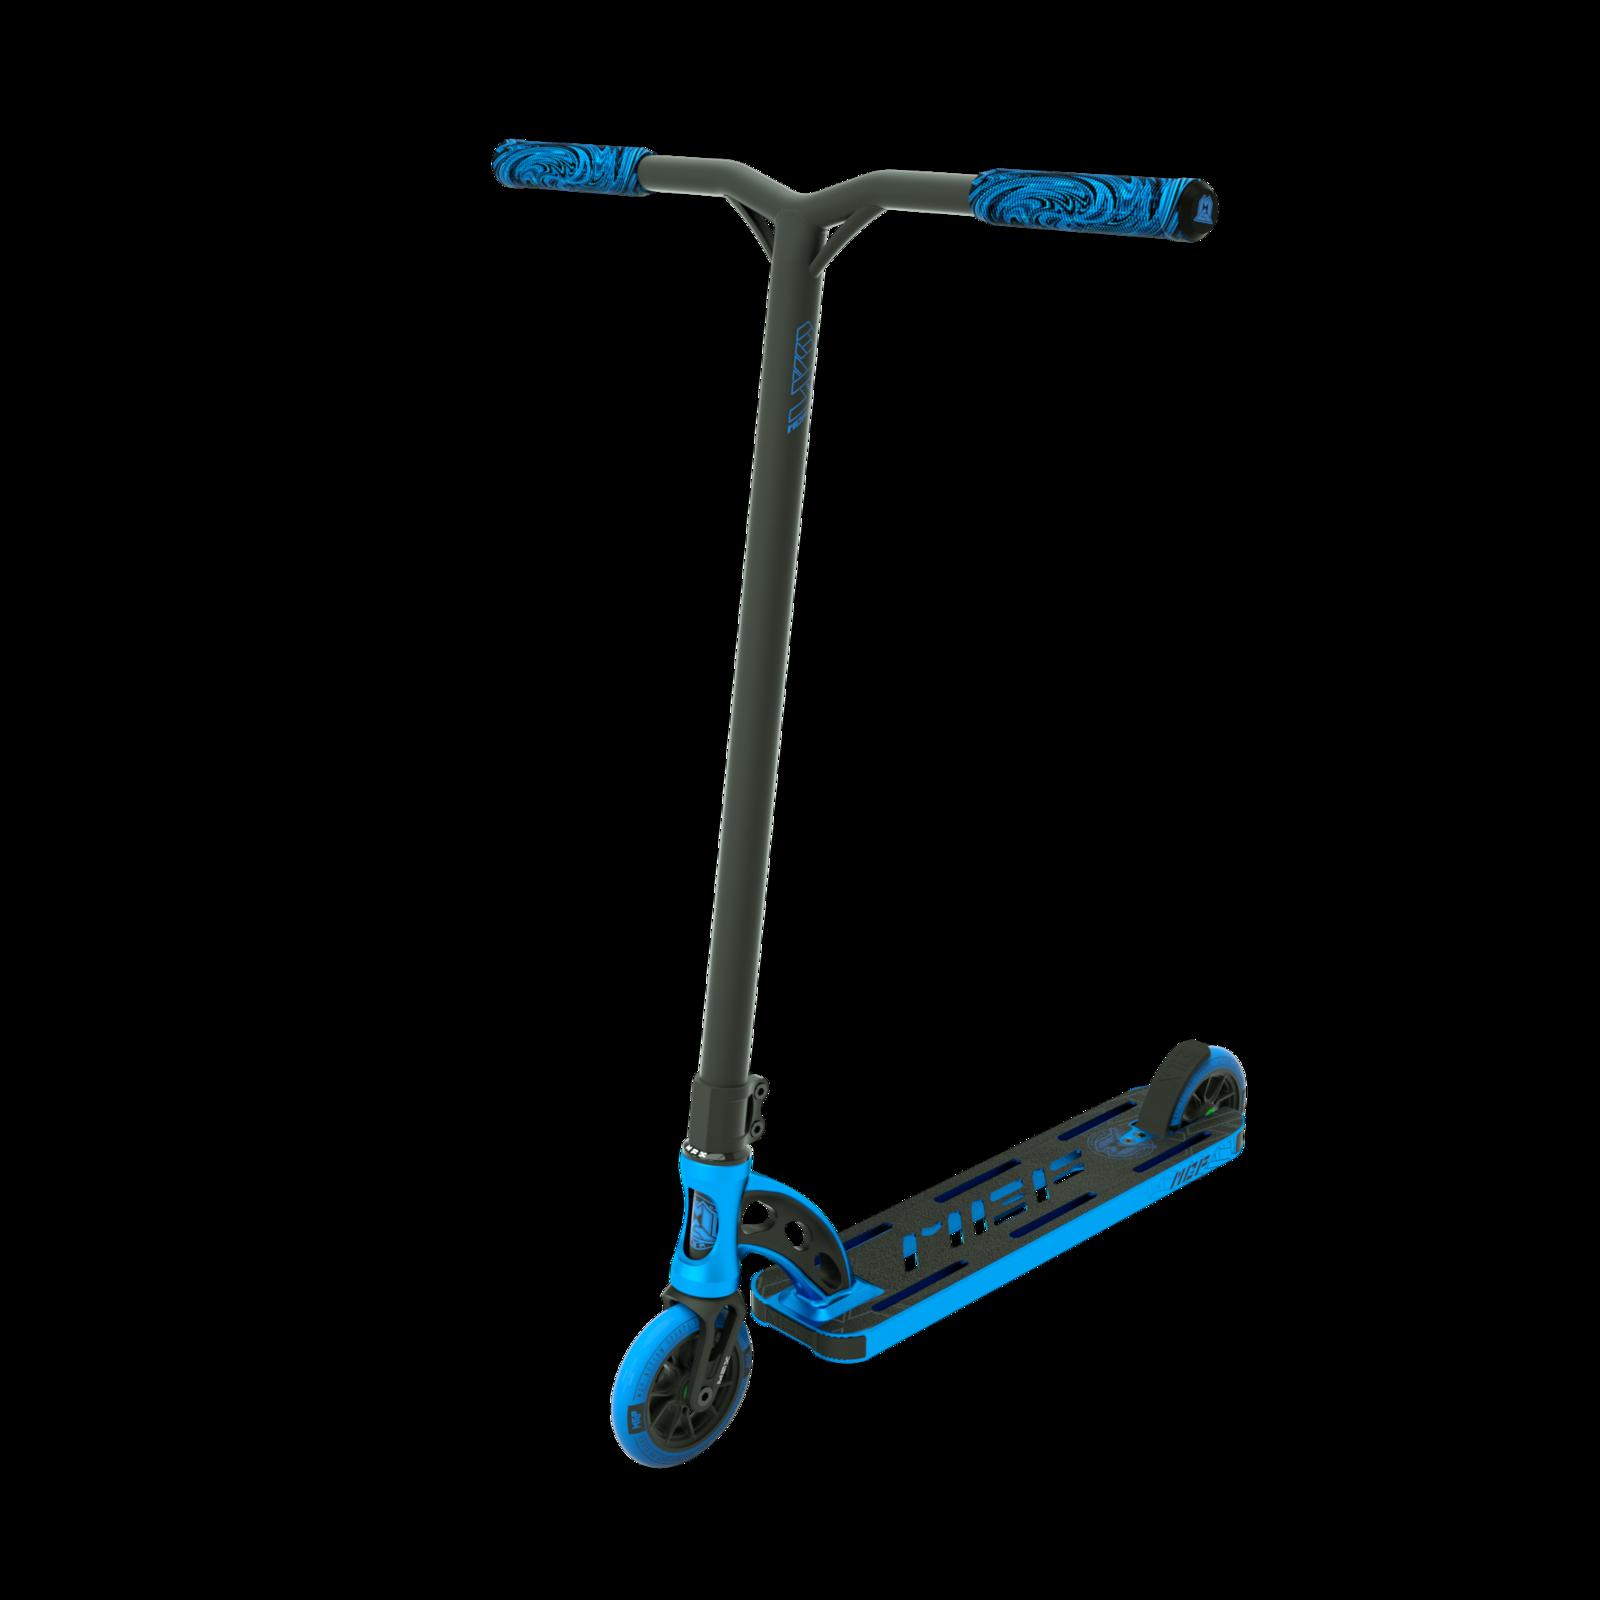 MADD Gear: VX9 Team Scooter - Blue image